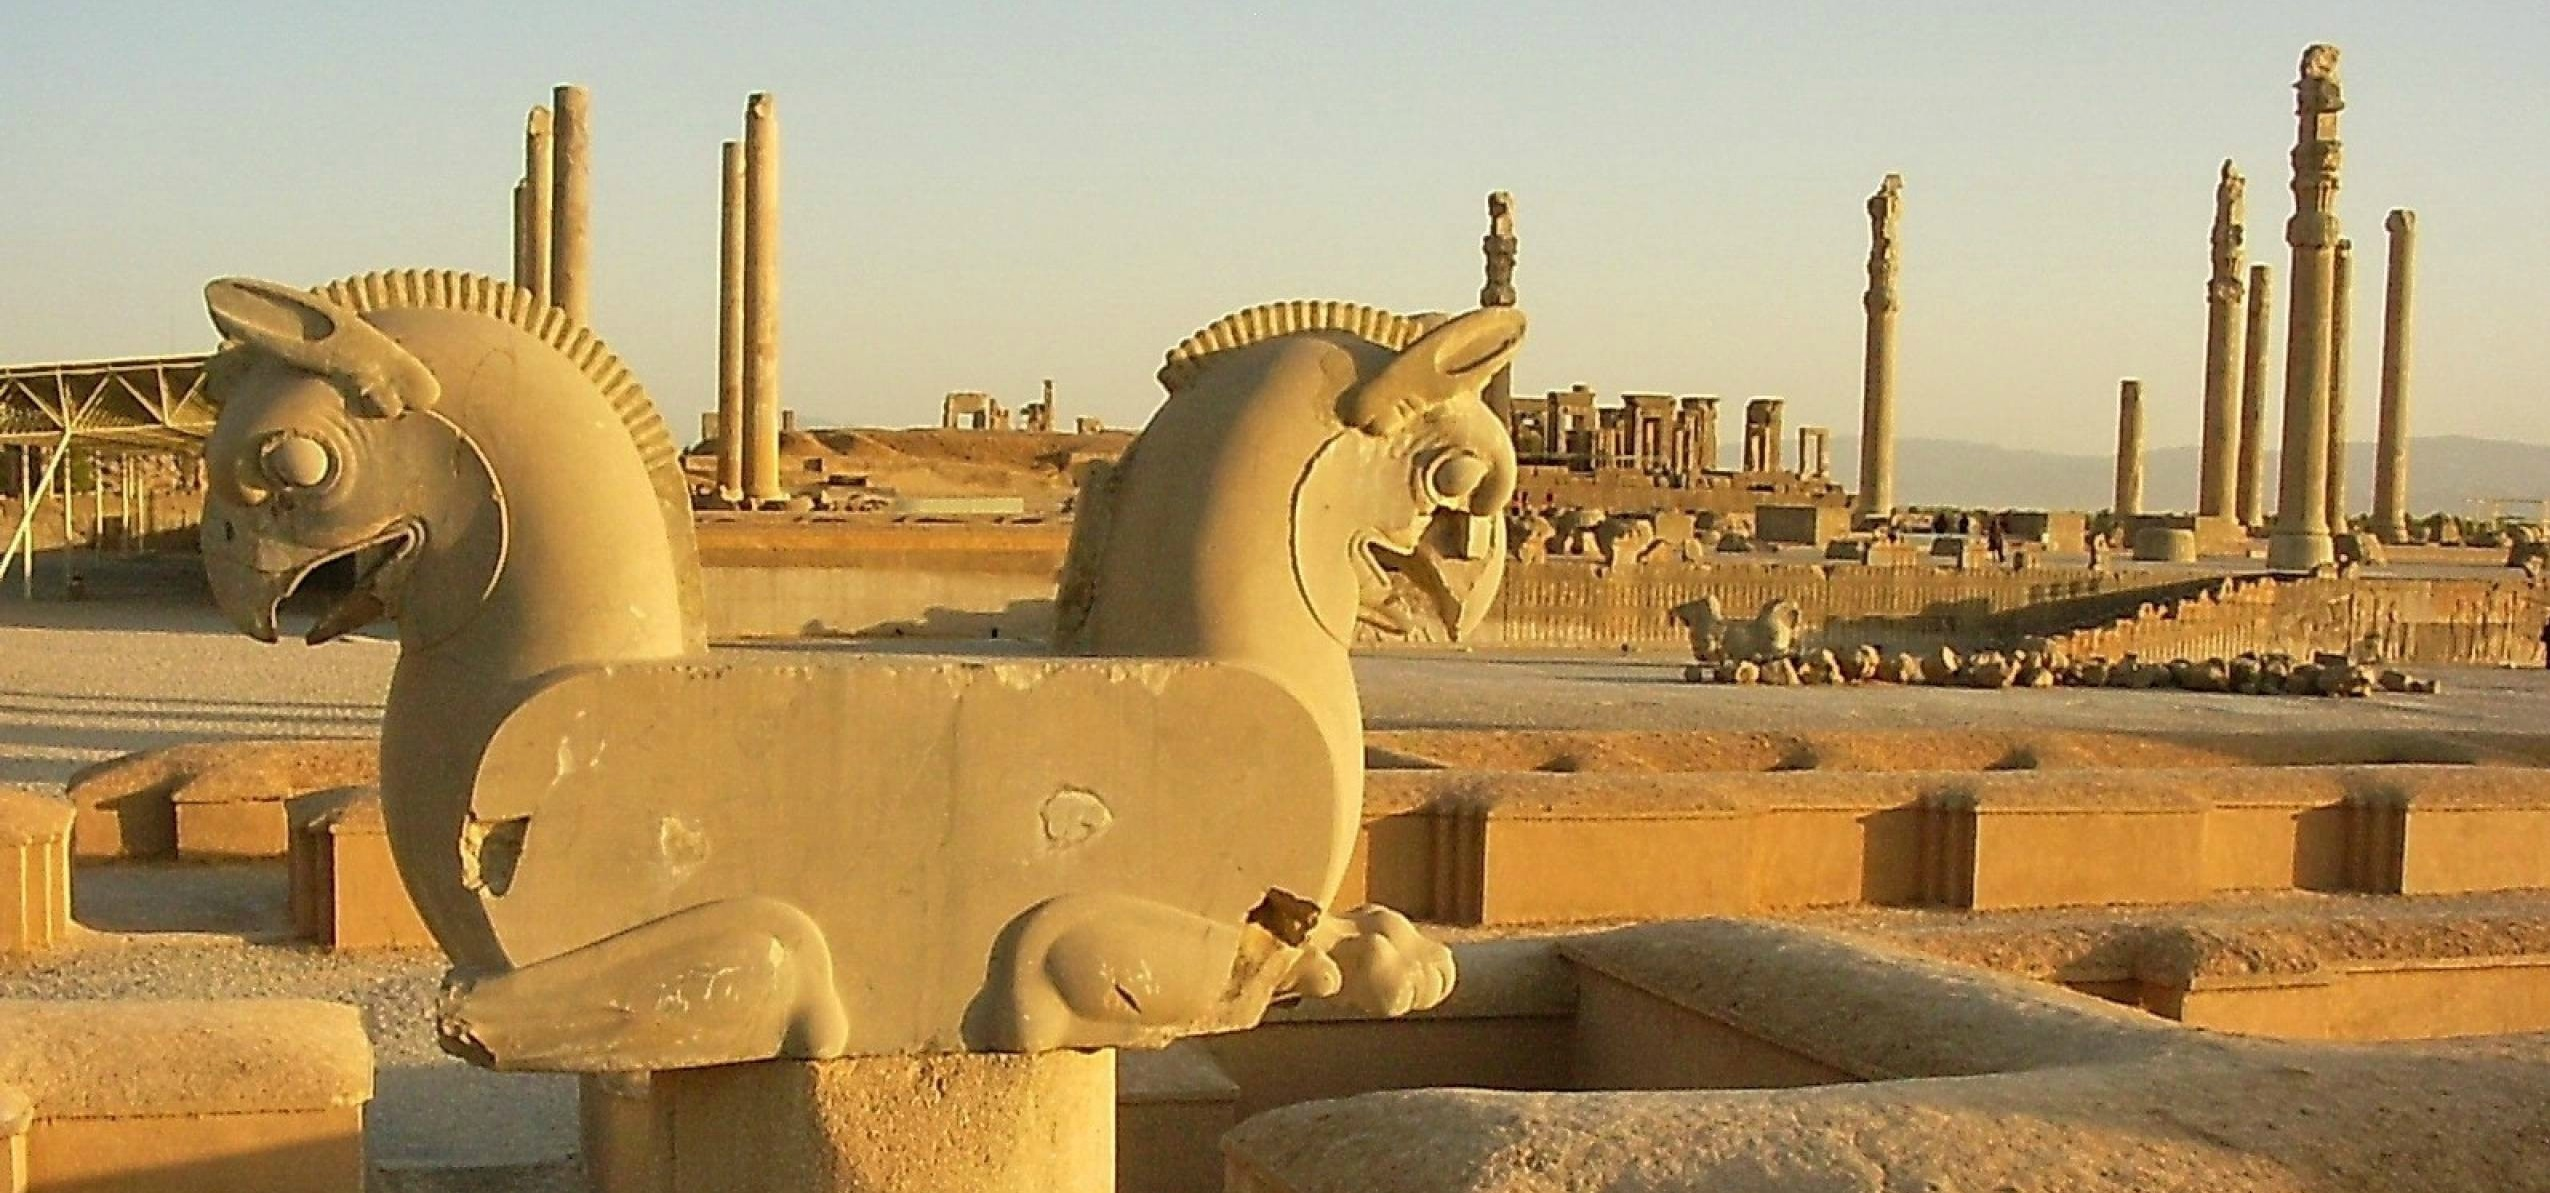 Giorno 6: Abarkuh-Persepolis-Shiraz